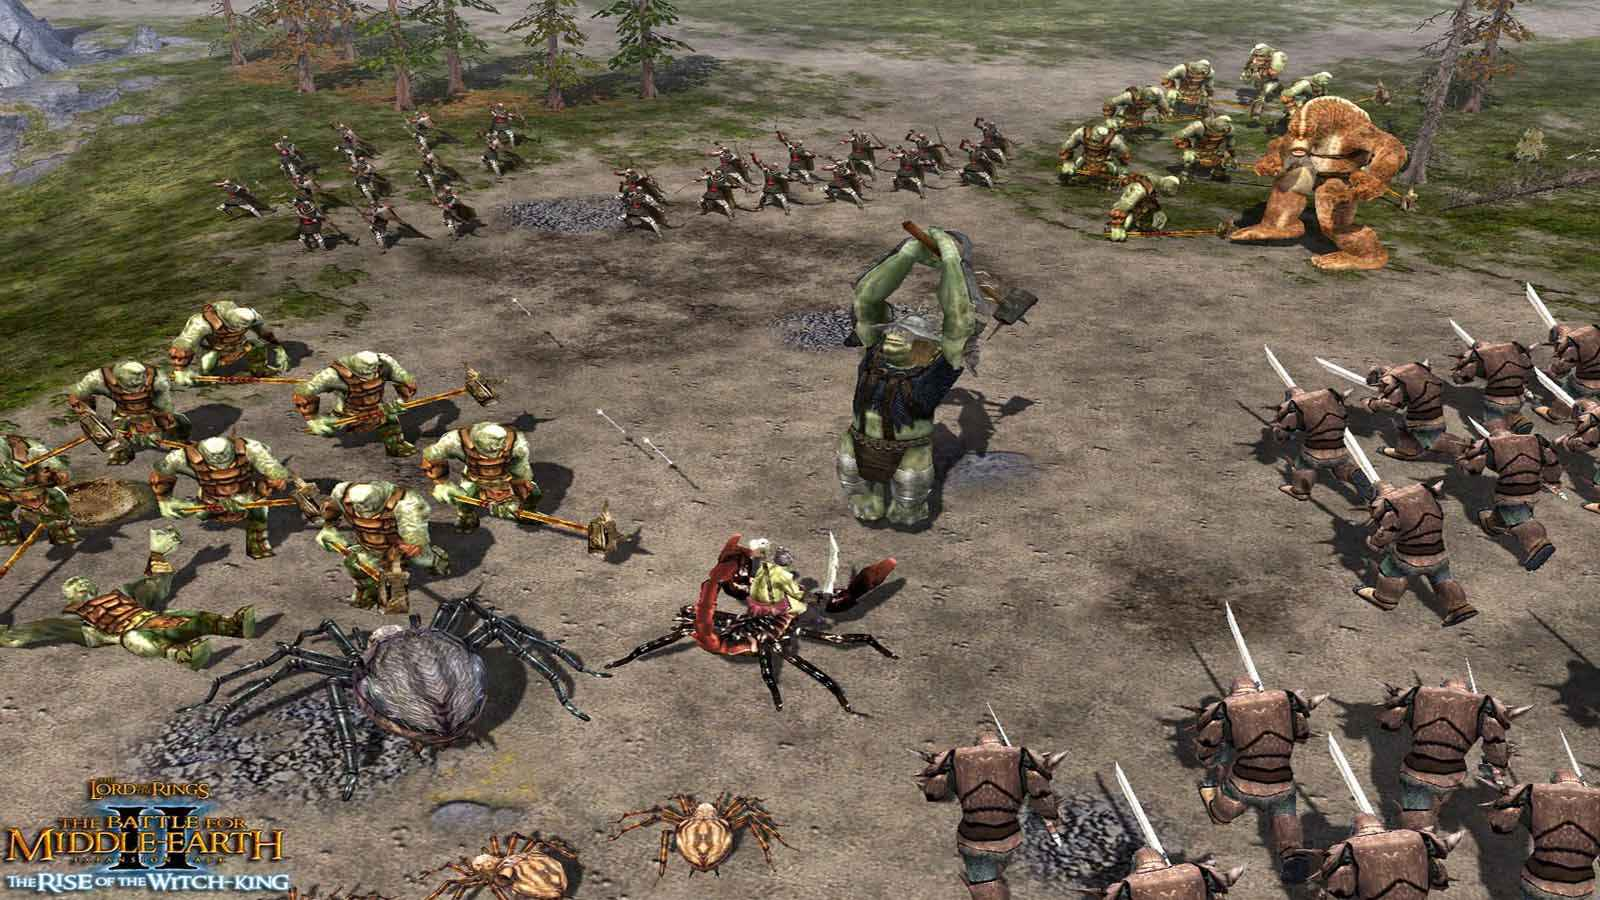 تحميل لعبة The Lord Of The Rings The Battle For Middle Earth 2 مضغوطة برابط واحد مباشر كاملة مجانا